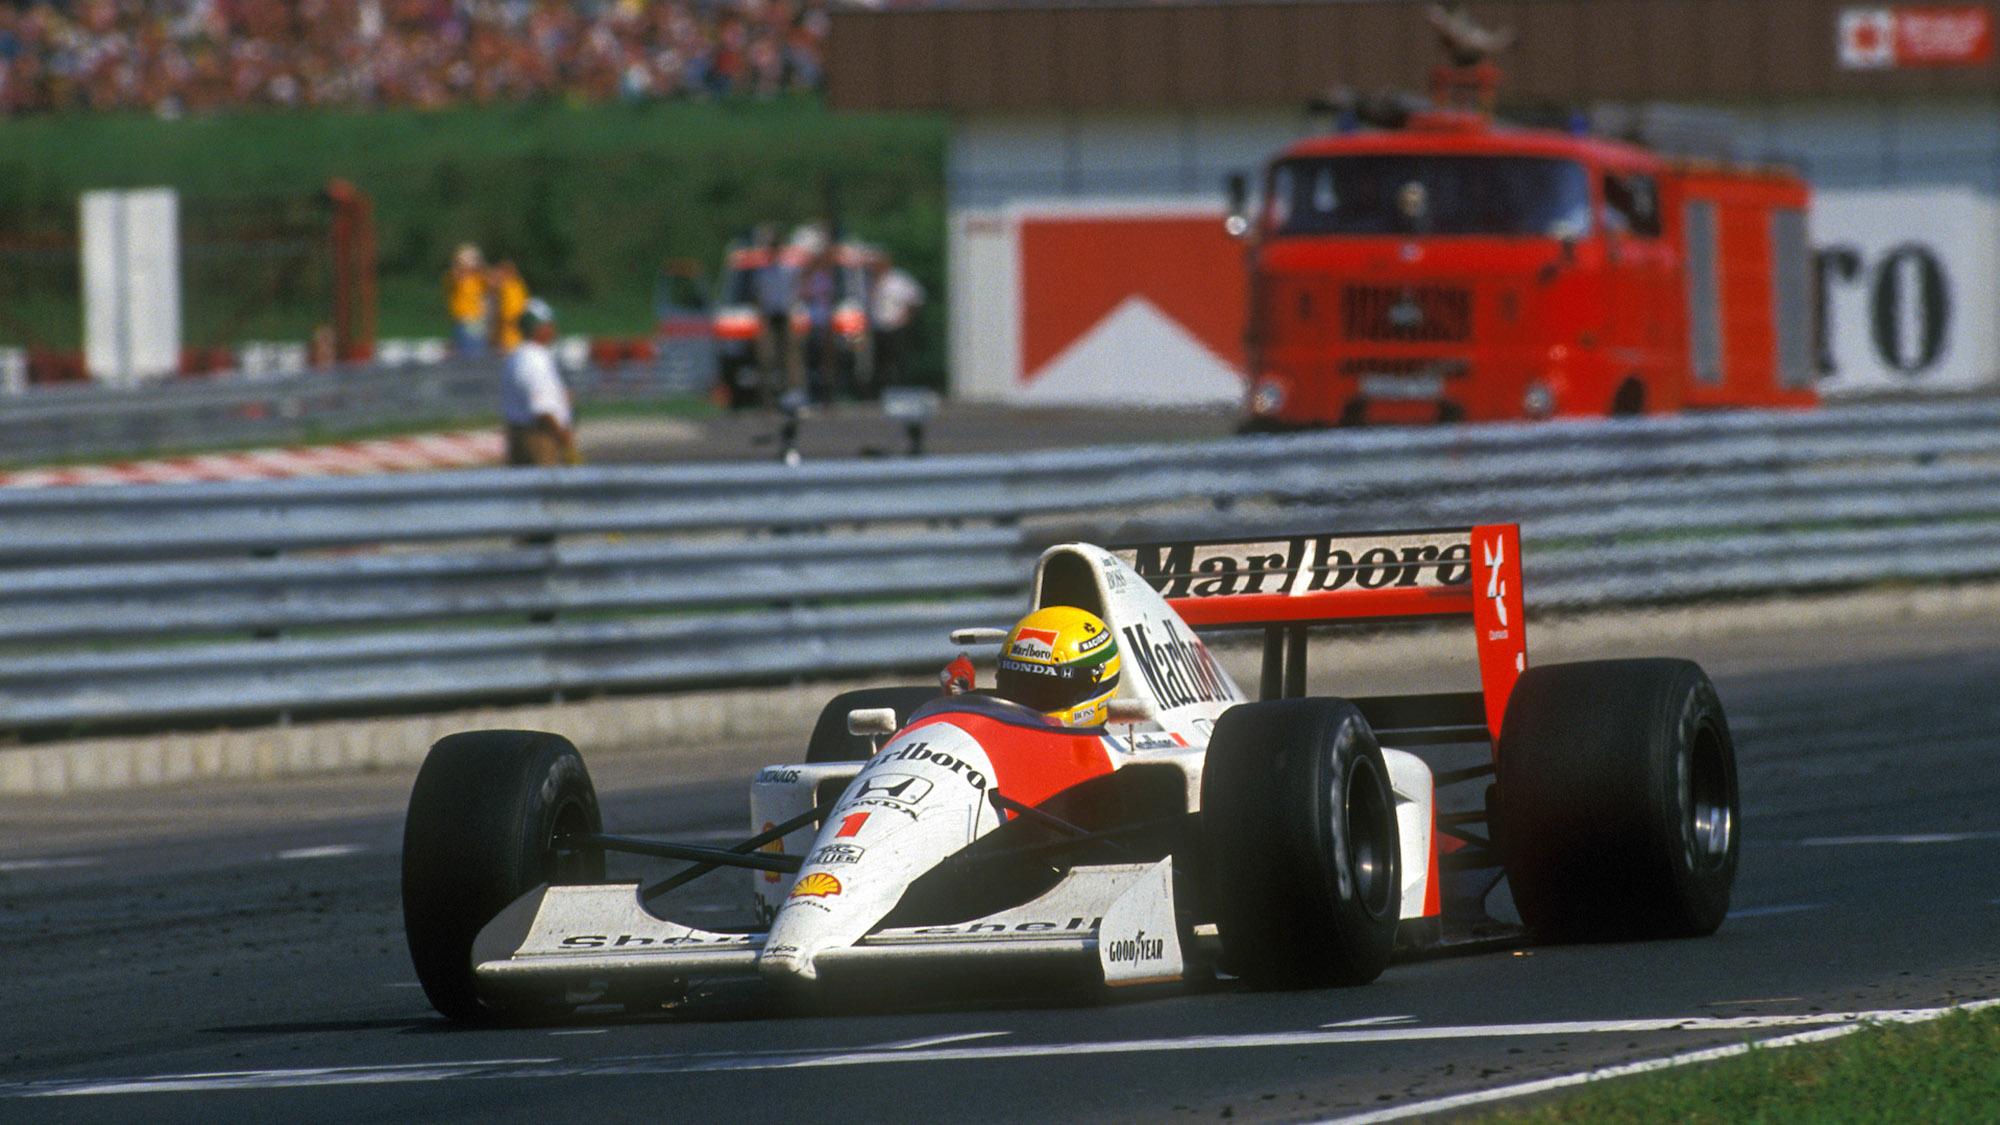 Ayrton Senna crosses the line to win the 1991 Hungarian Grand Prix